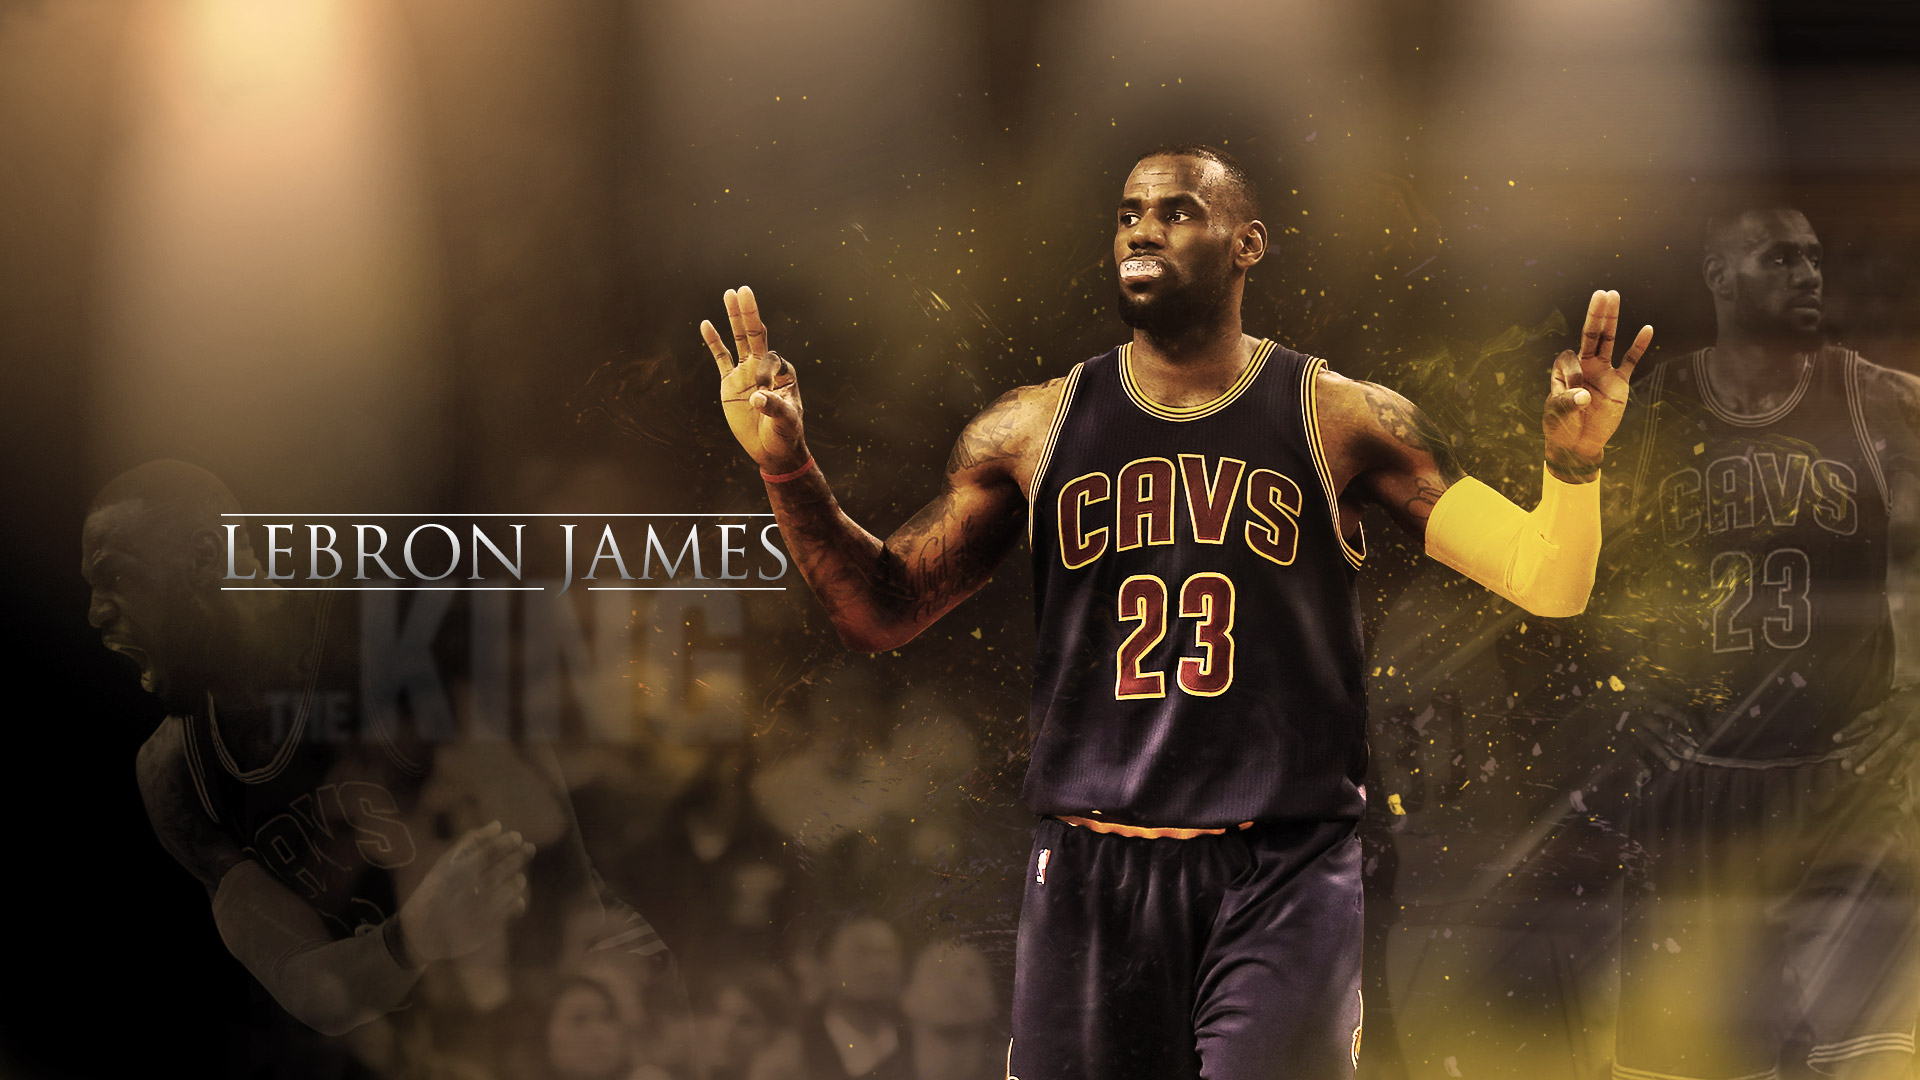 LeBron James Cavaliers 2016 19201080 Wallpaper Basketball 1920x1080